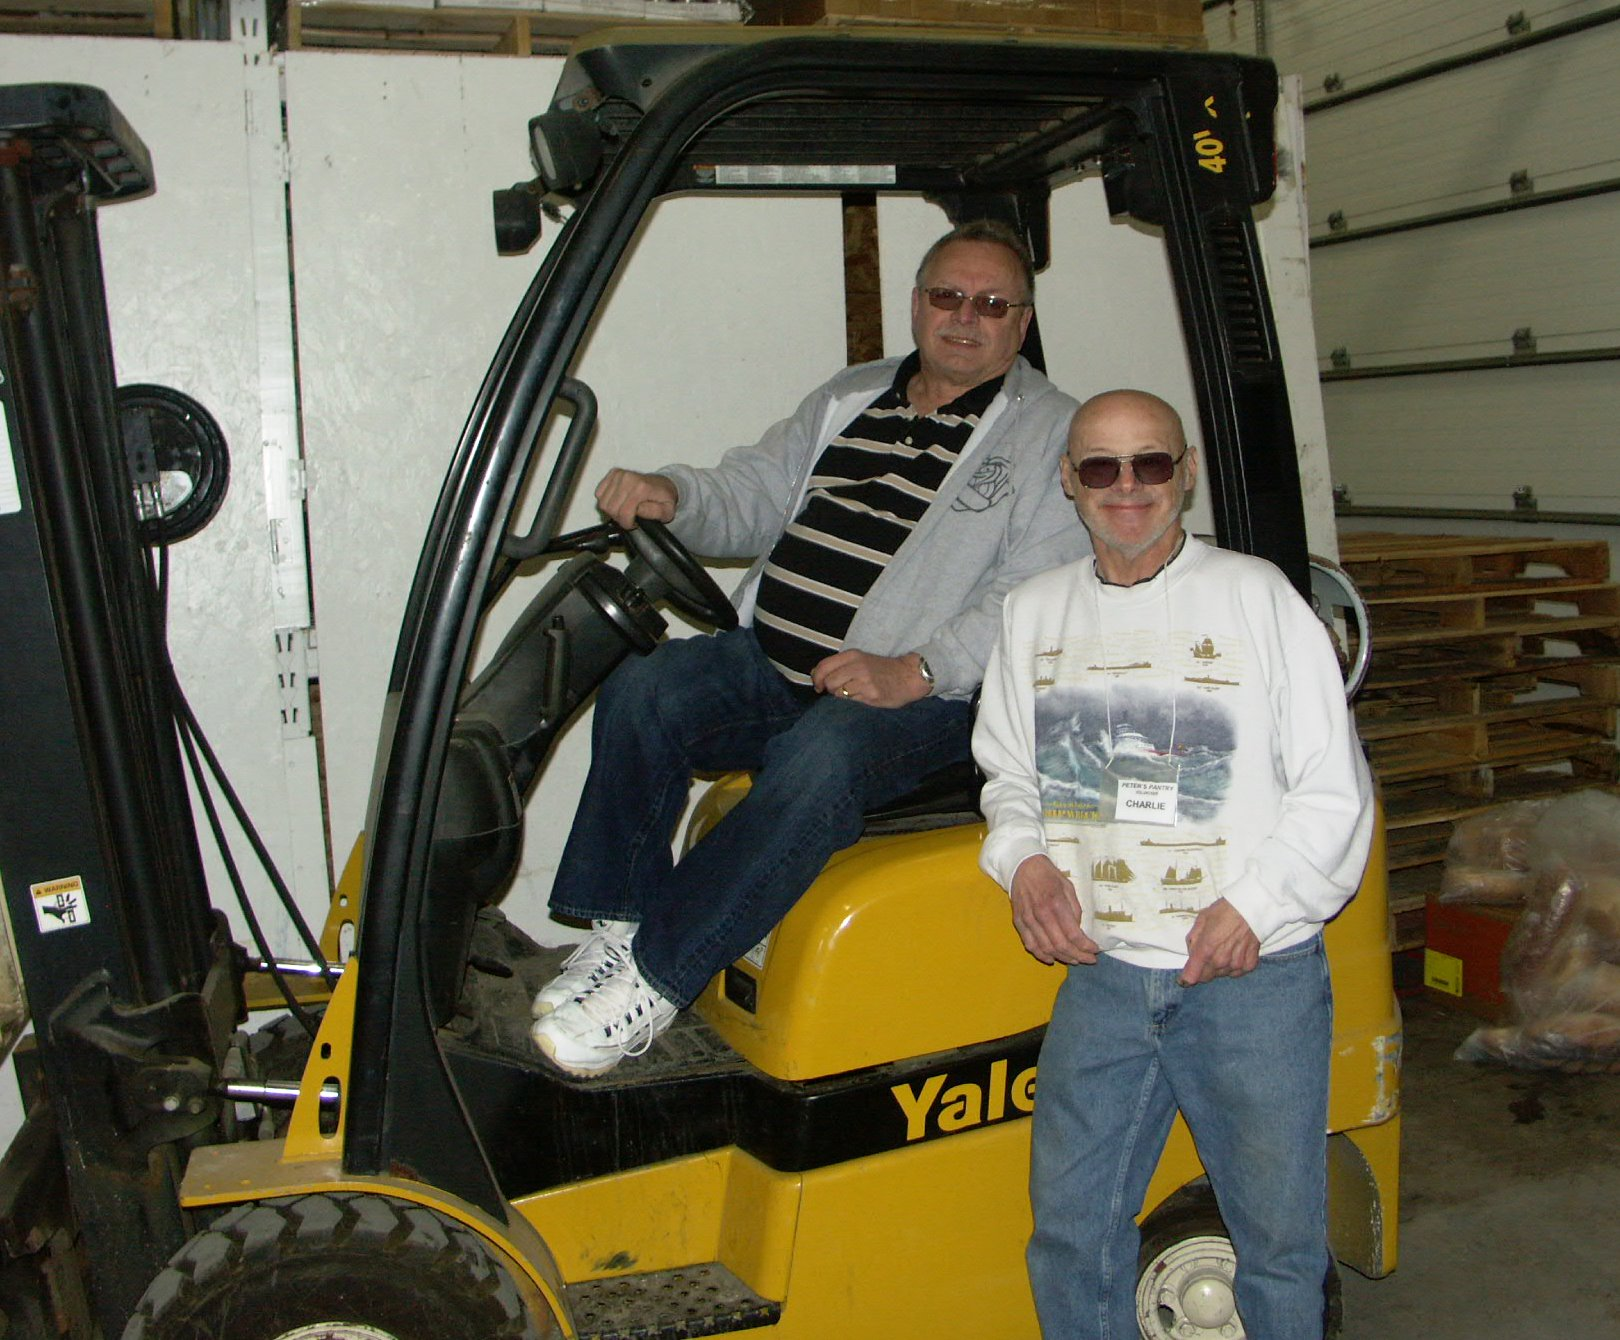 Volunteers with forklift